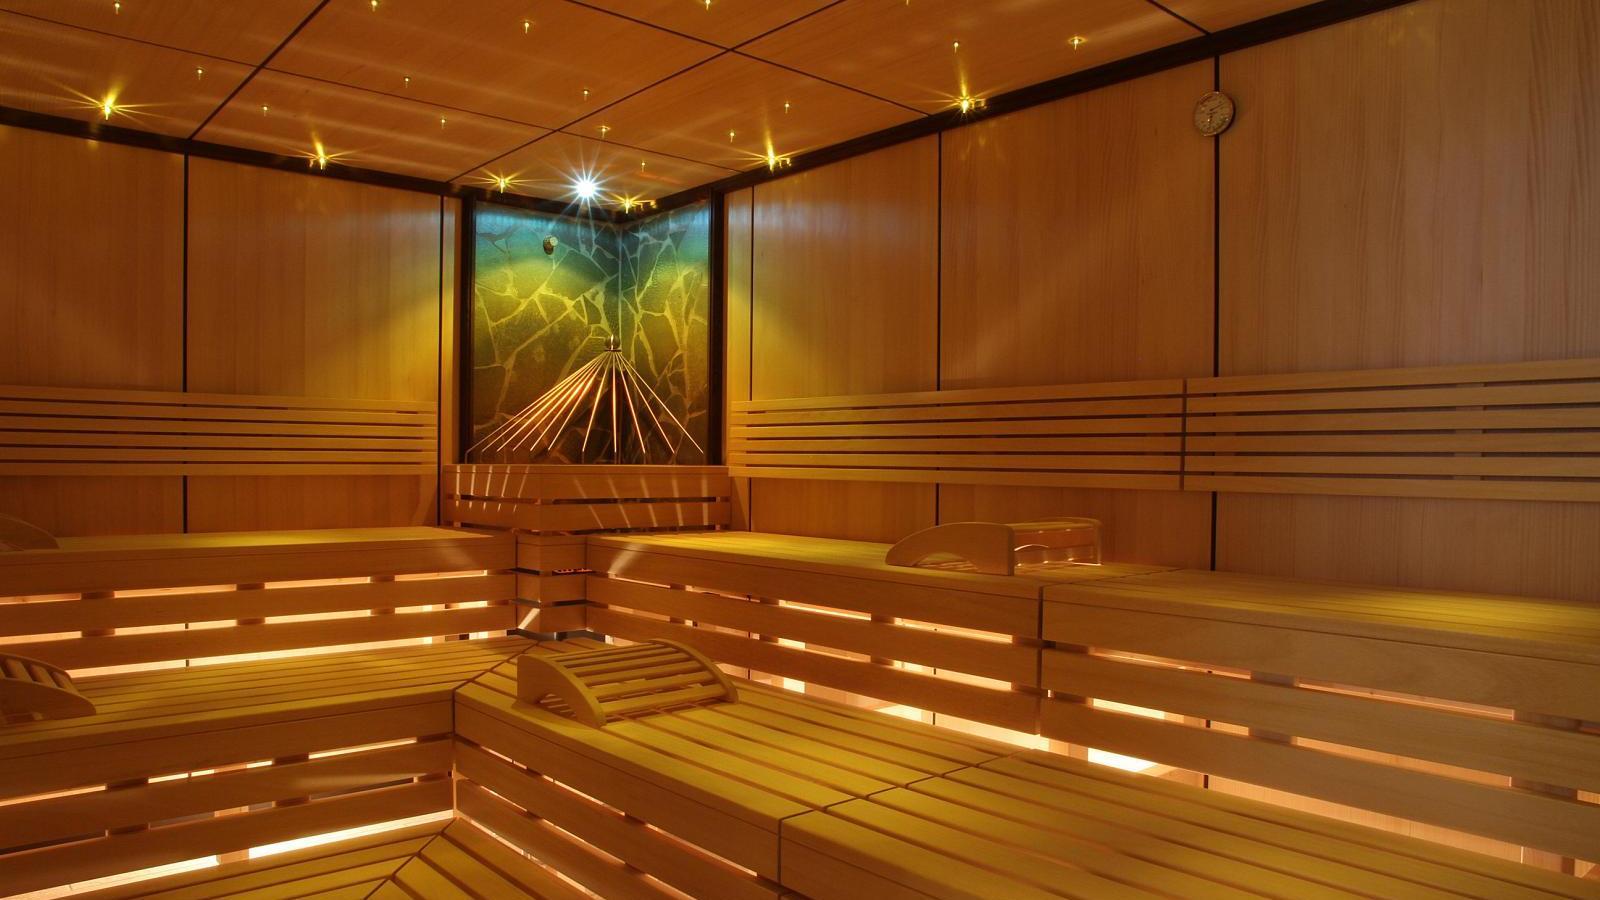 kortingscode bilderberg hotel prefecture montpellier certificat de non gage. Black Bedroom Furniture Sets. Home Design Ideas